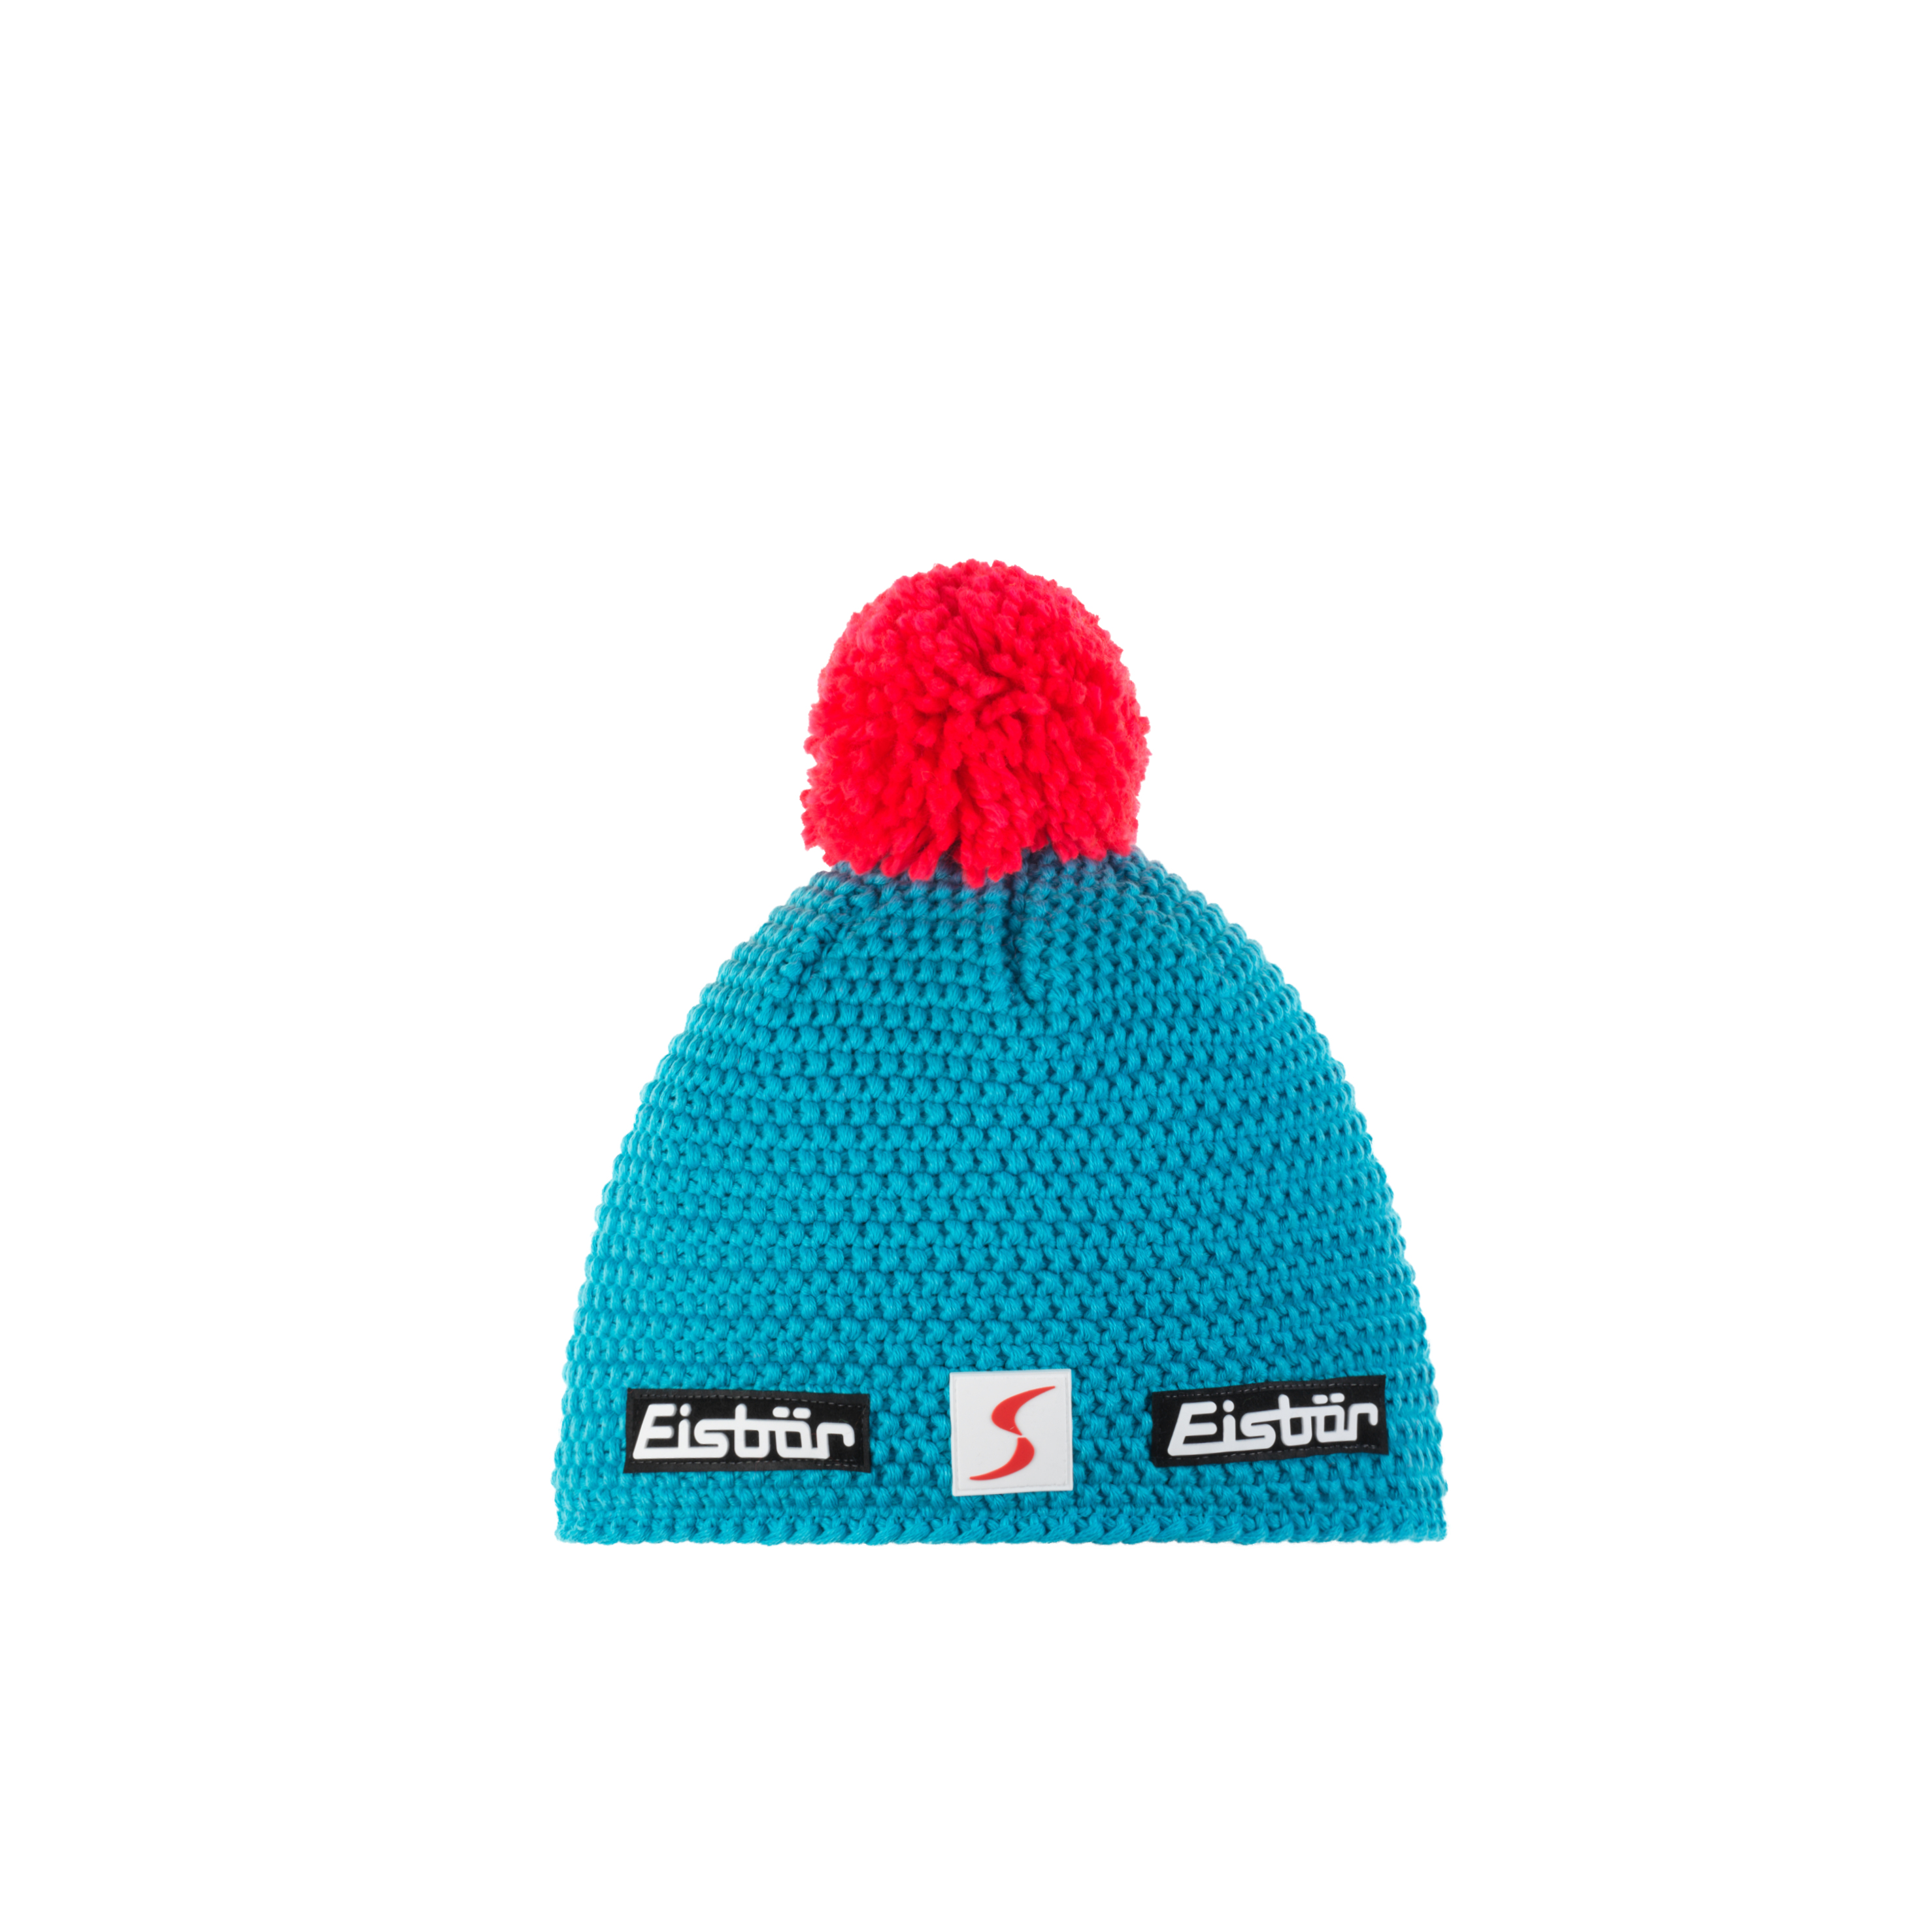 Eisbär Jamie Pompon Mütze SP - blau